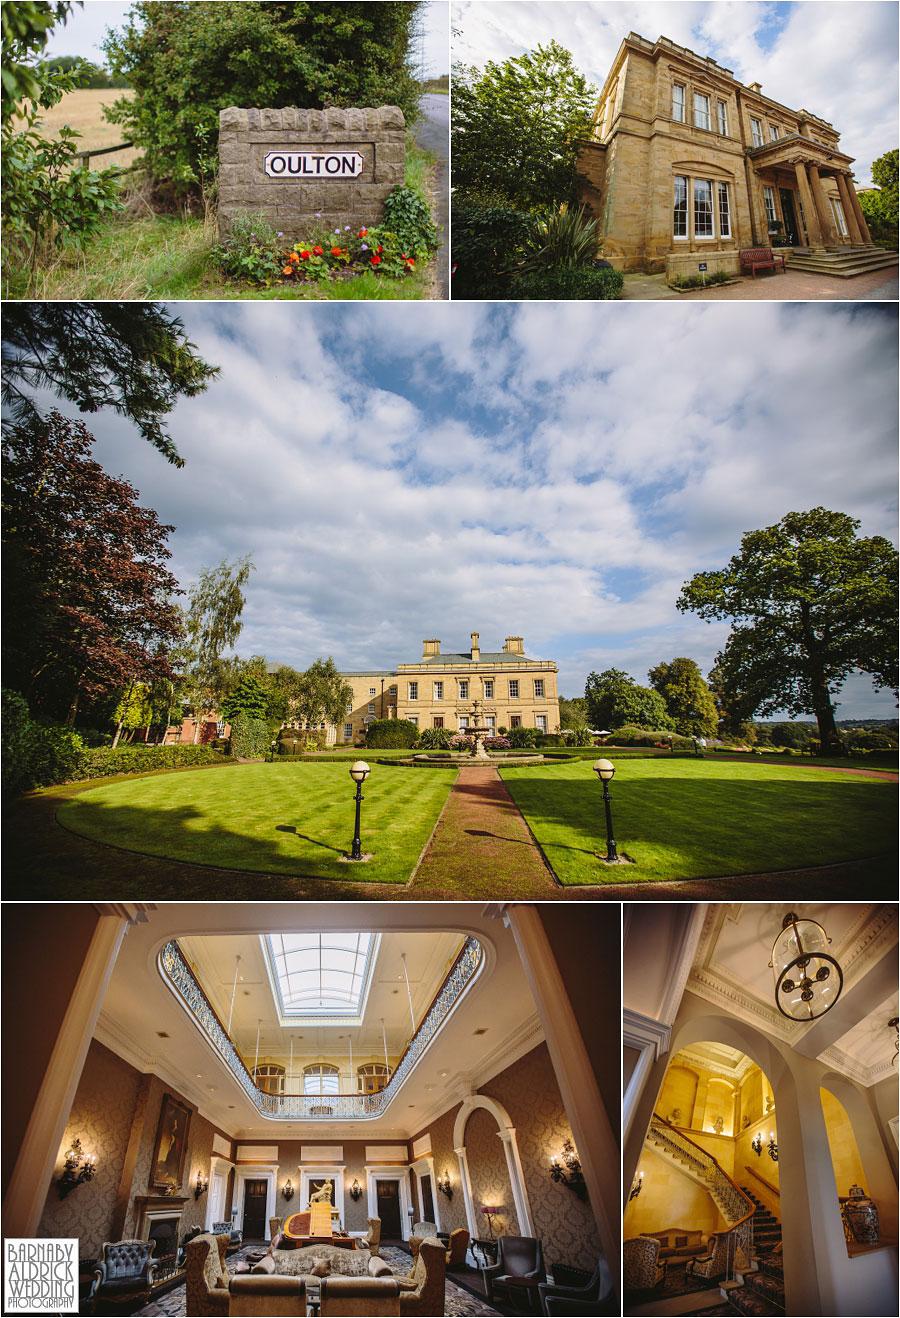 oulton-hall-rothwell-leeds-wedding-photography-002